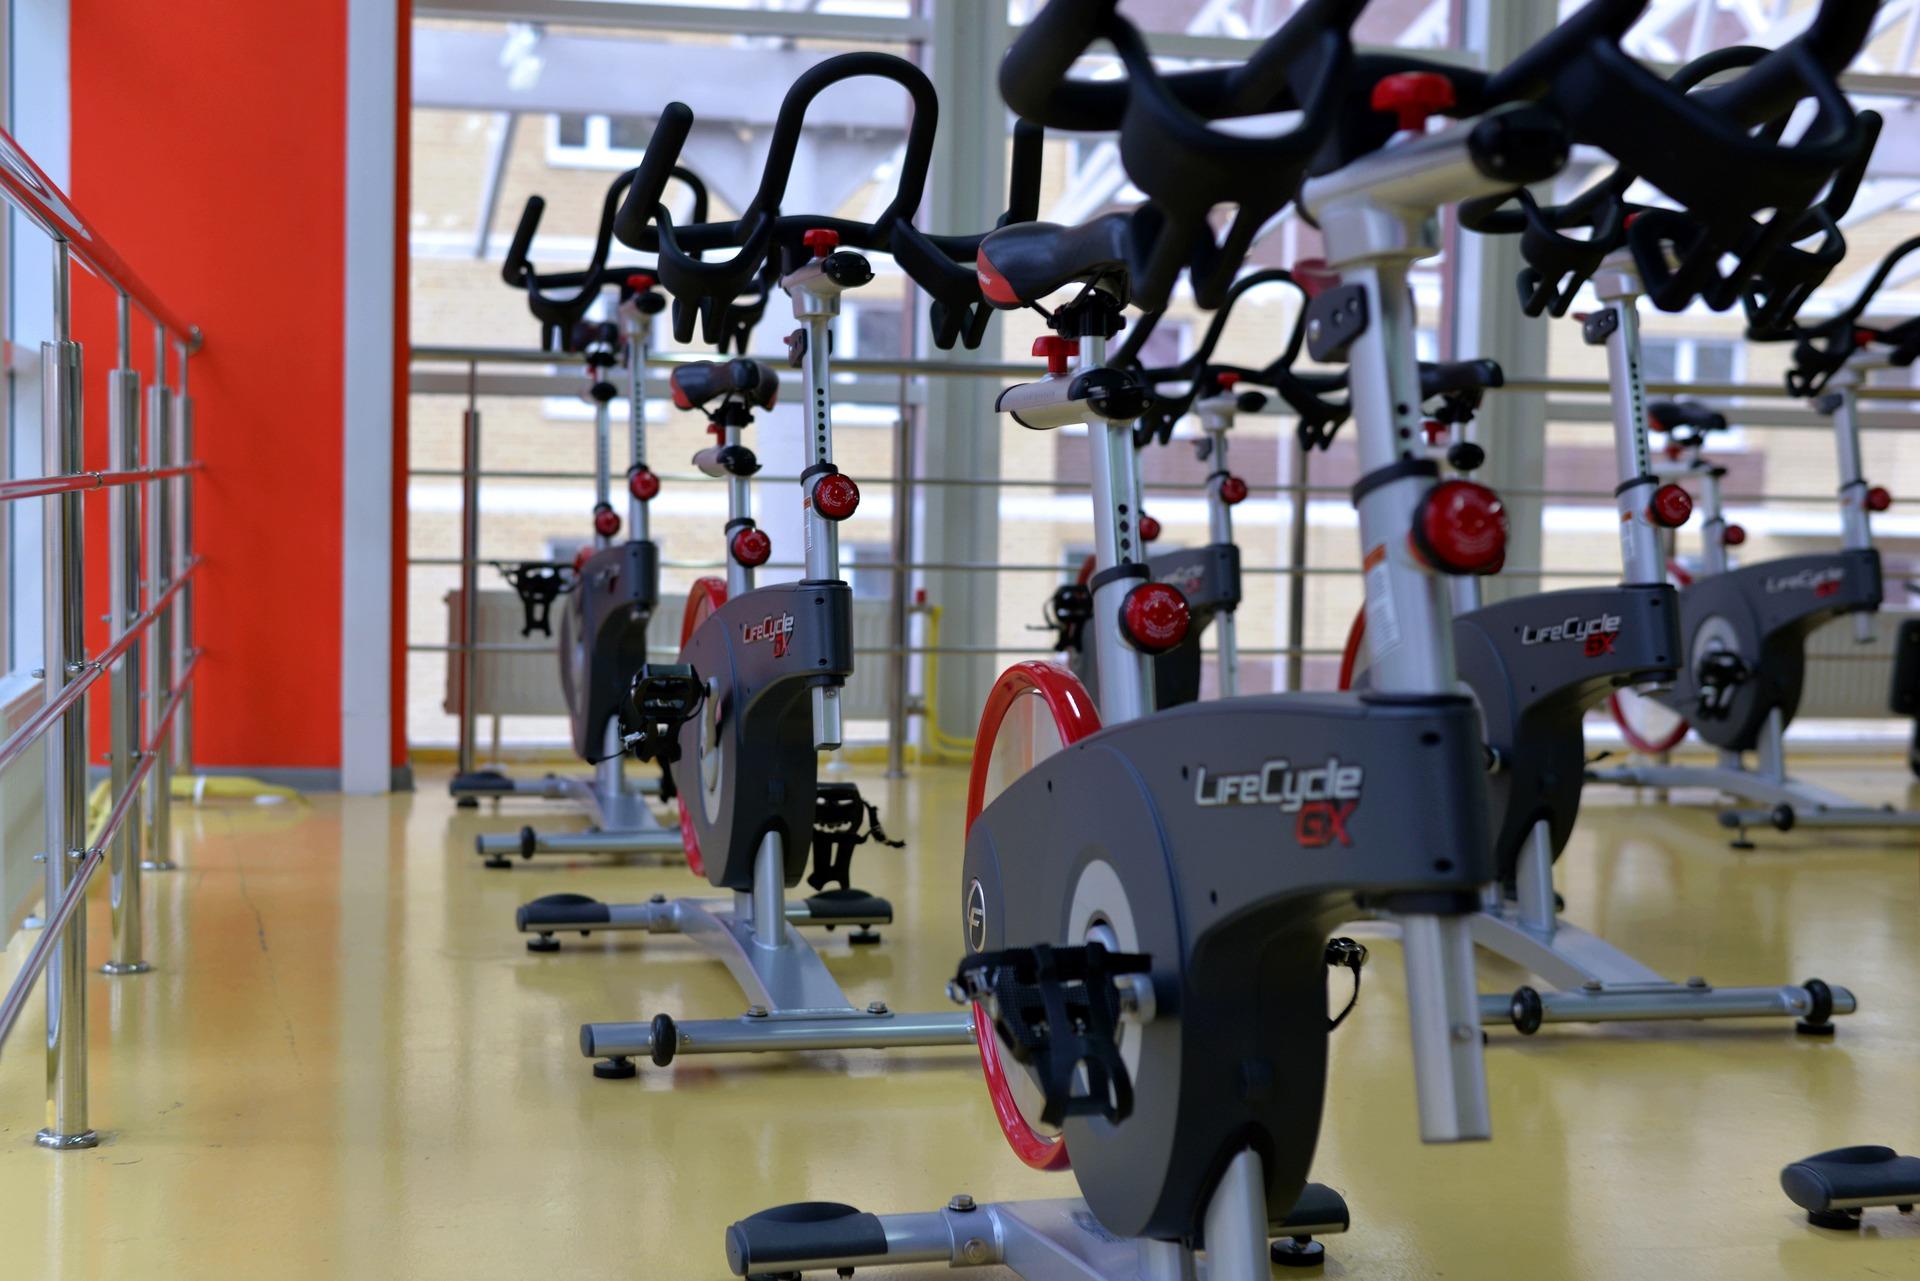 Photo showing exercise equipment